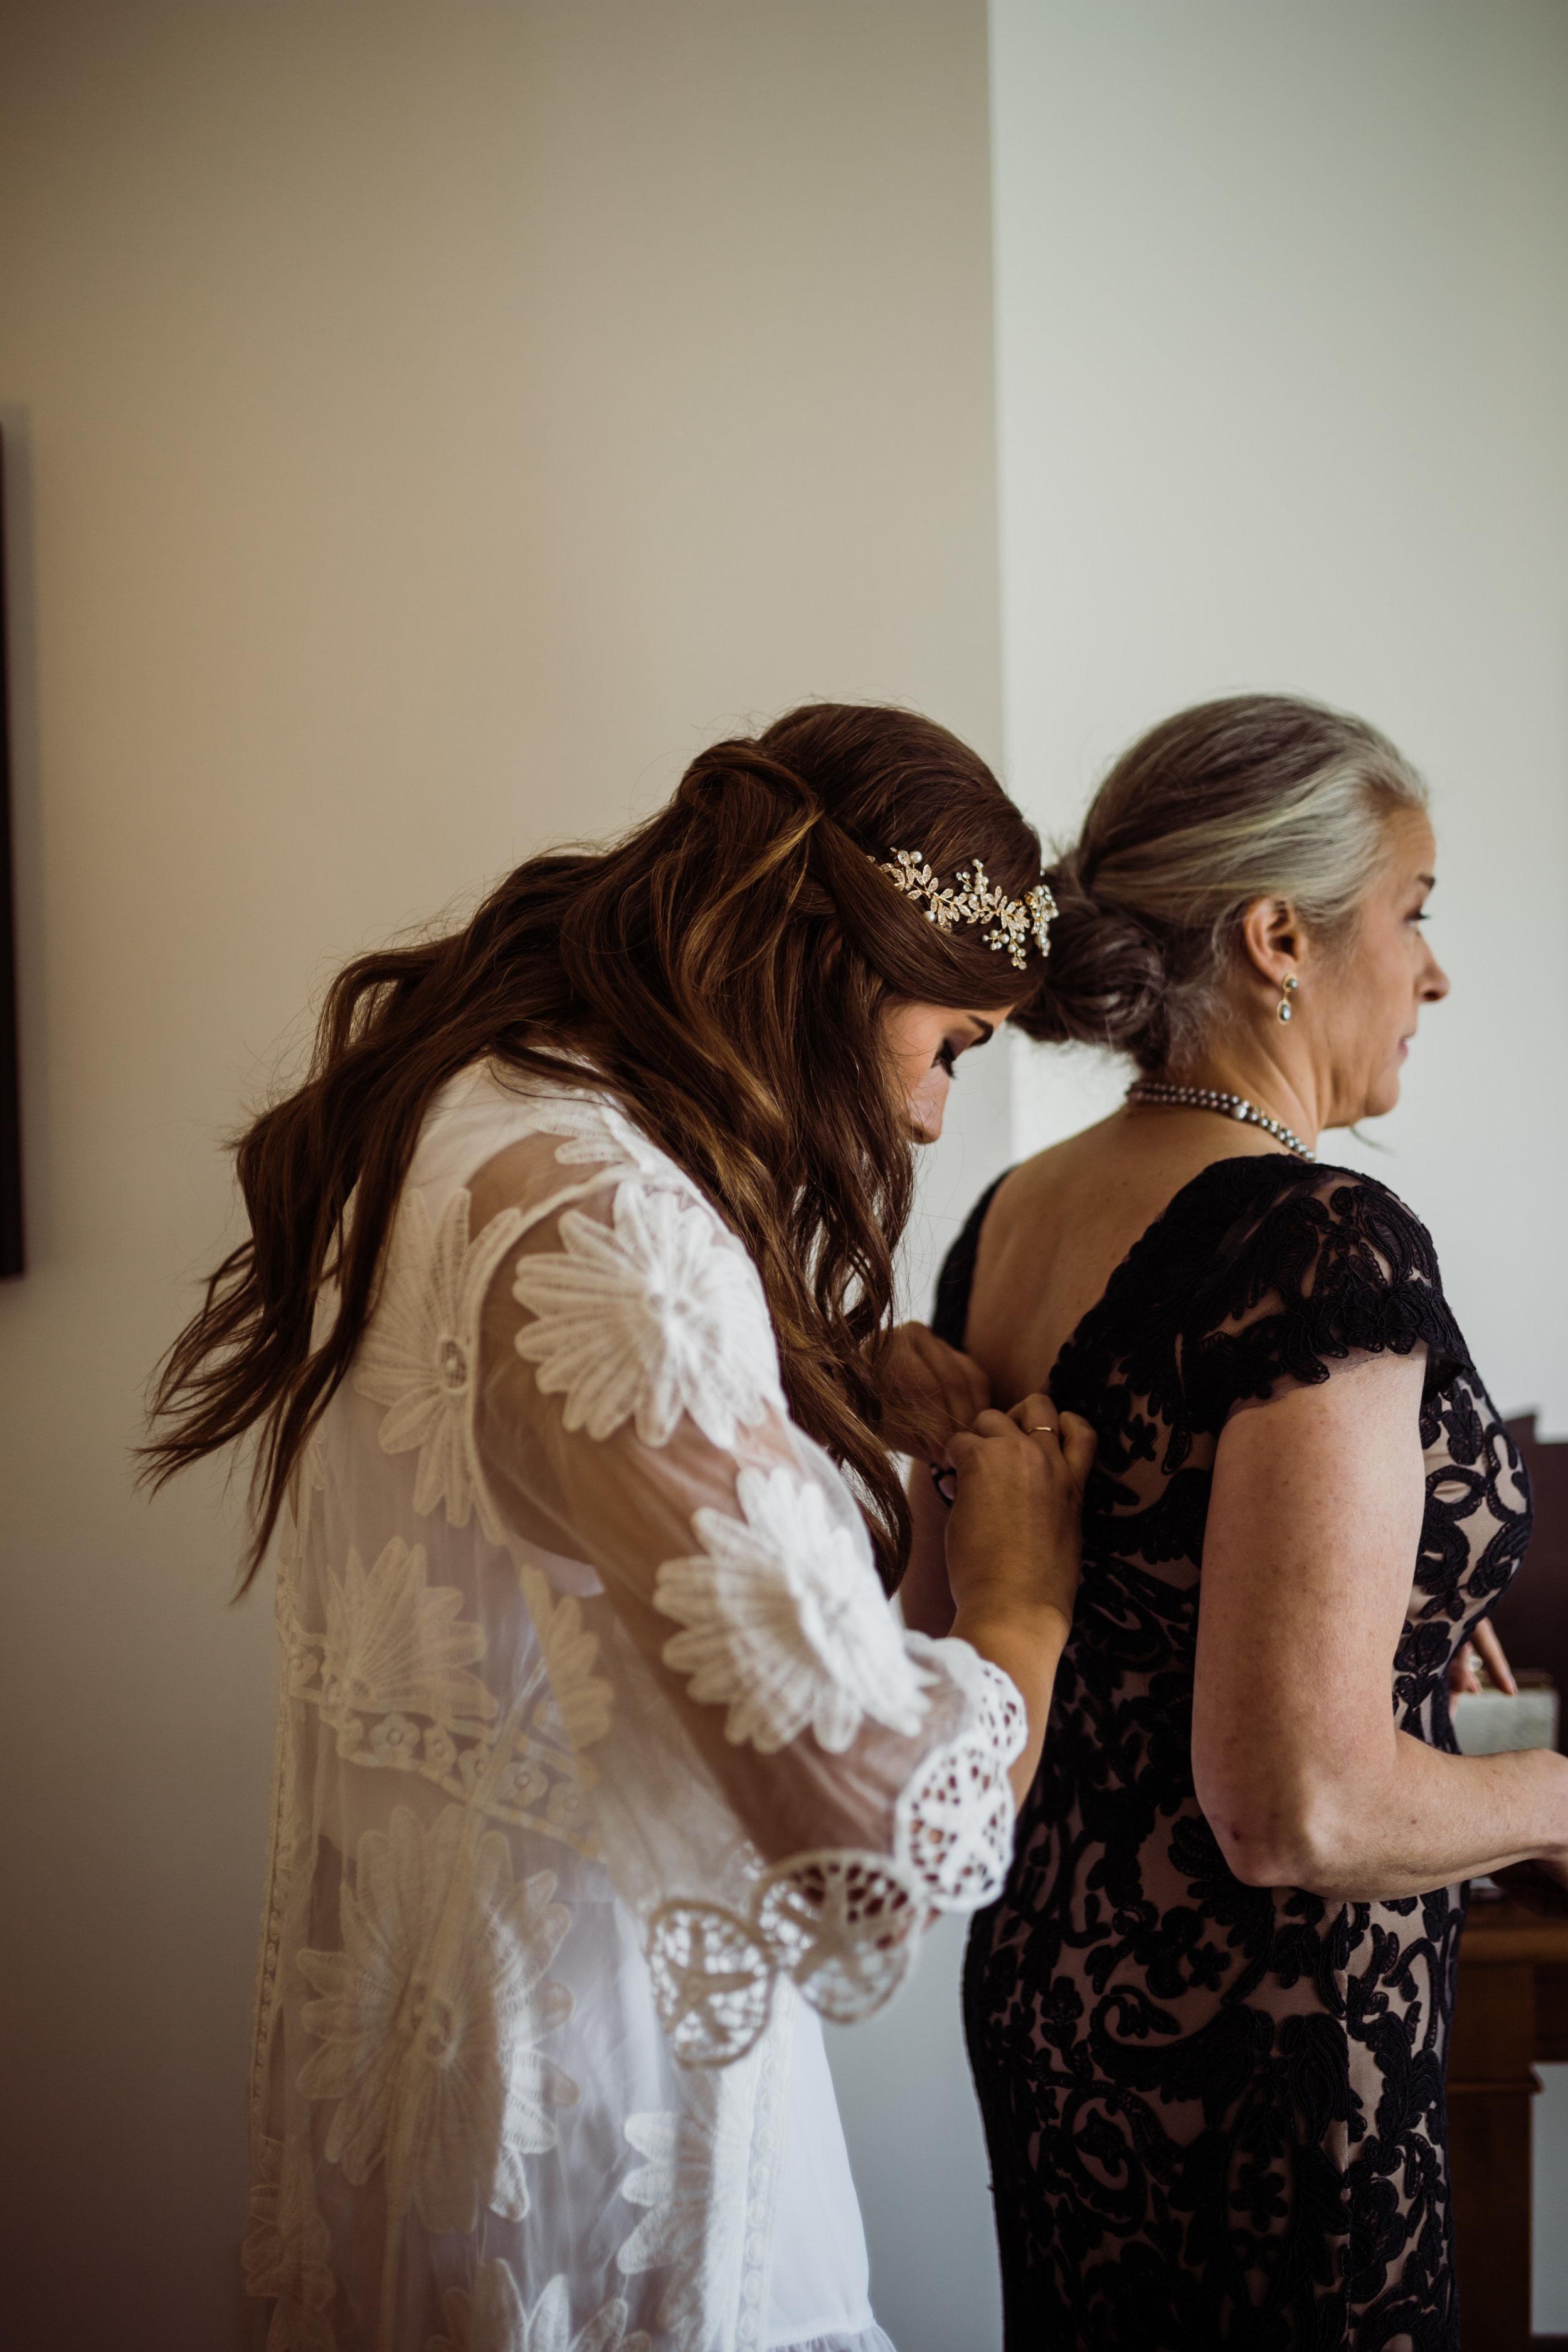 2017.10.15 Steffi and Elliott Simmonds Casa Feliz Wedding (21 of 969).jpg